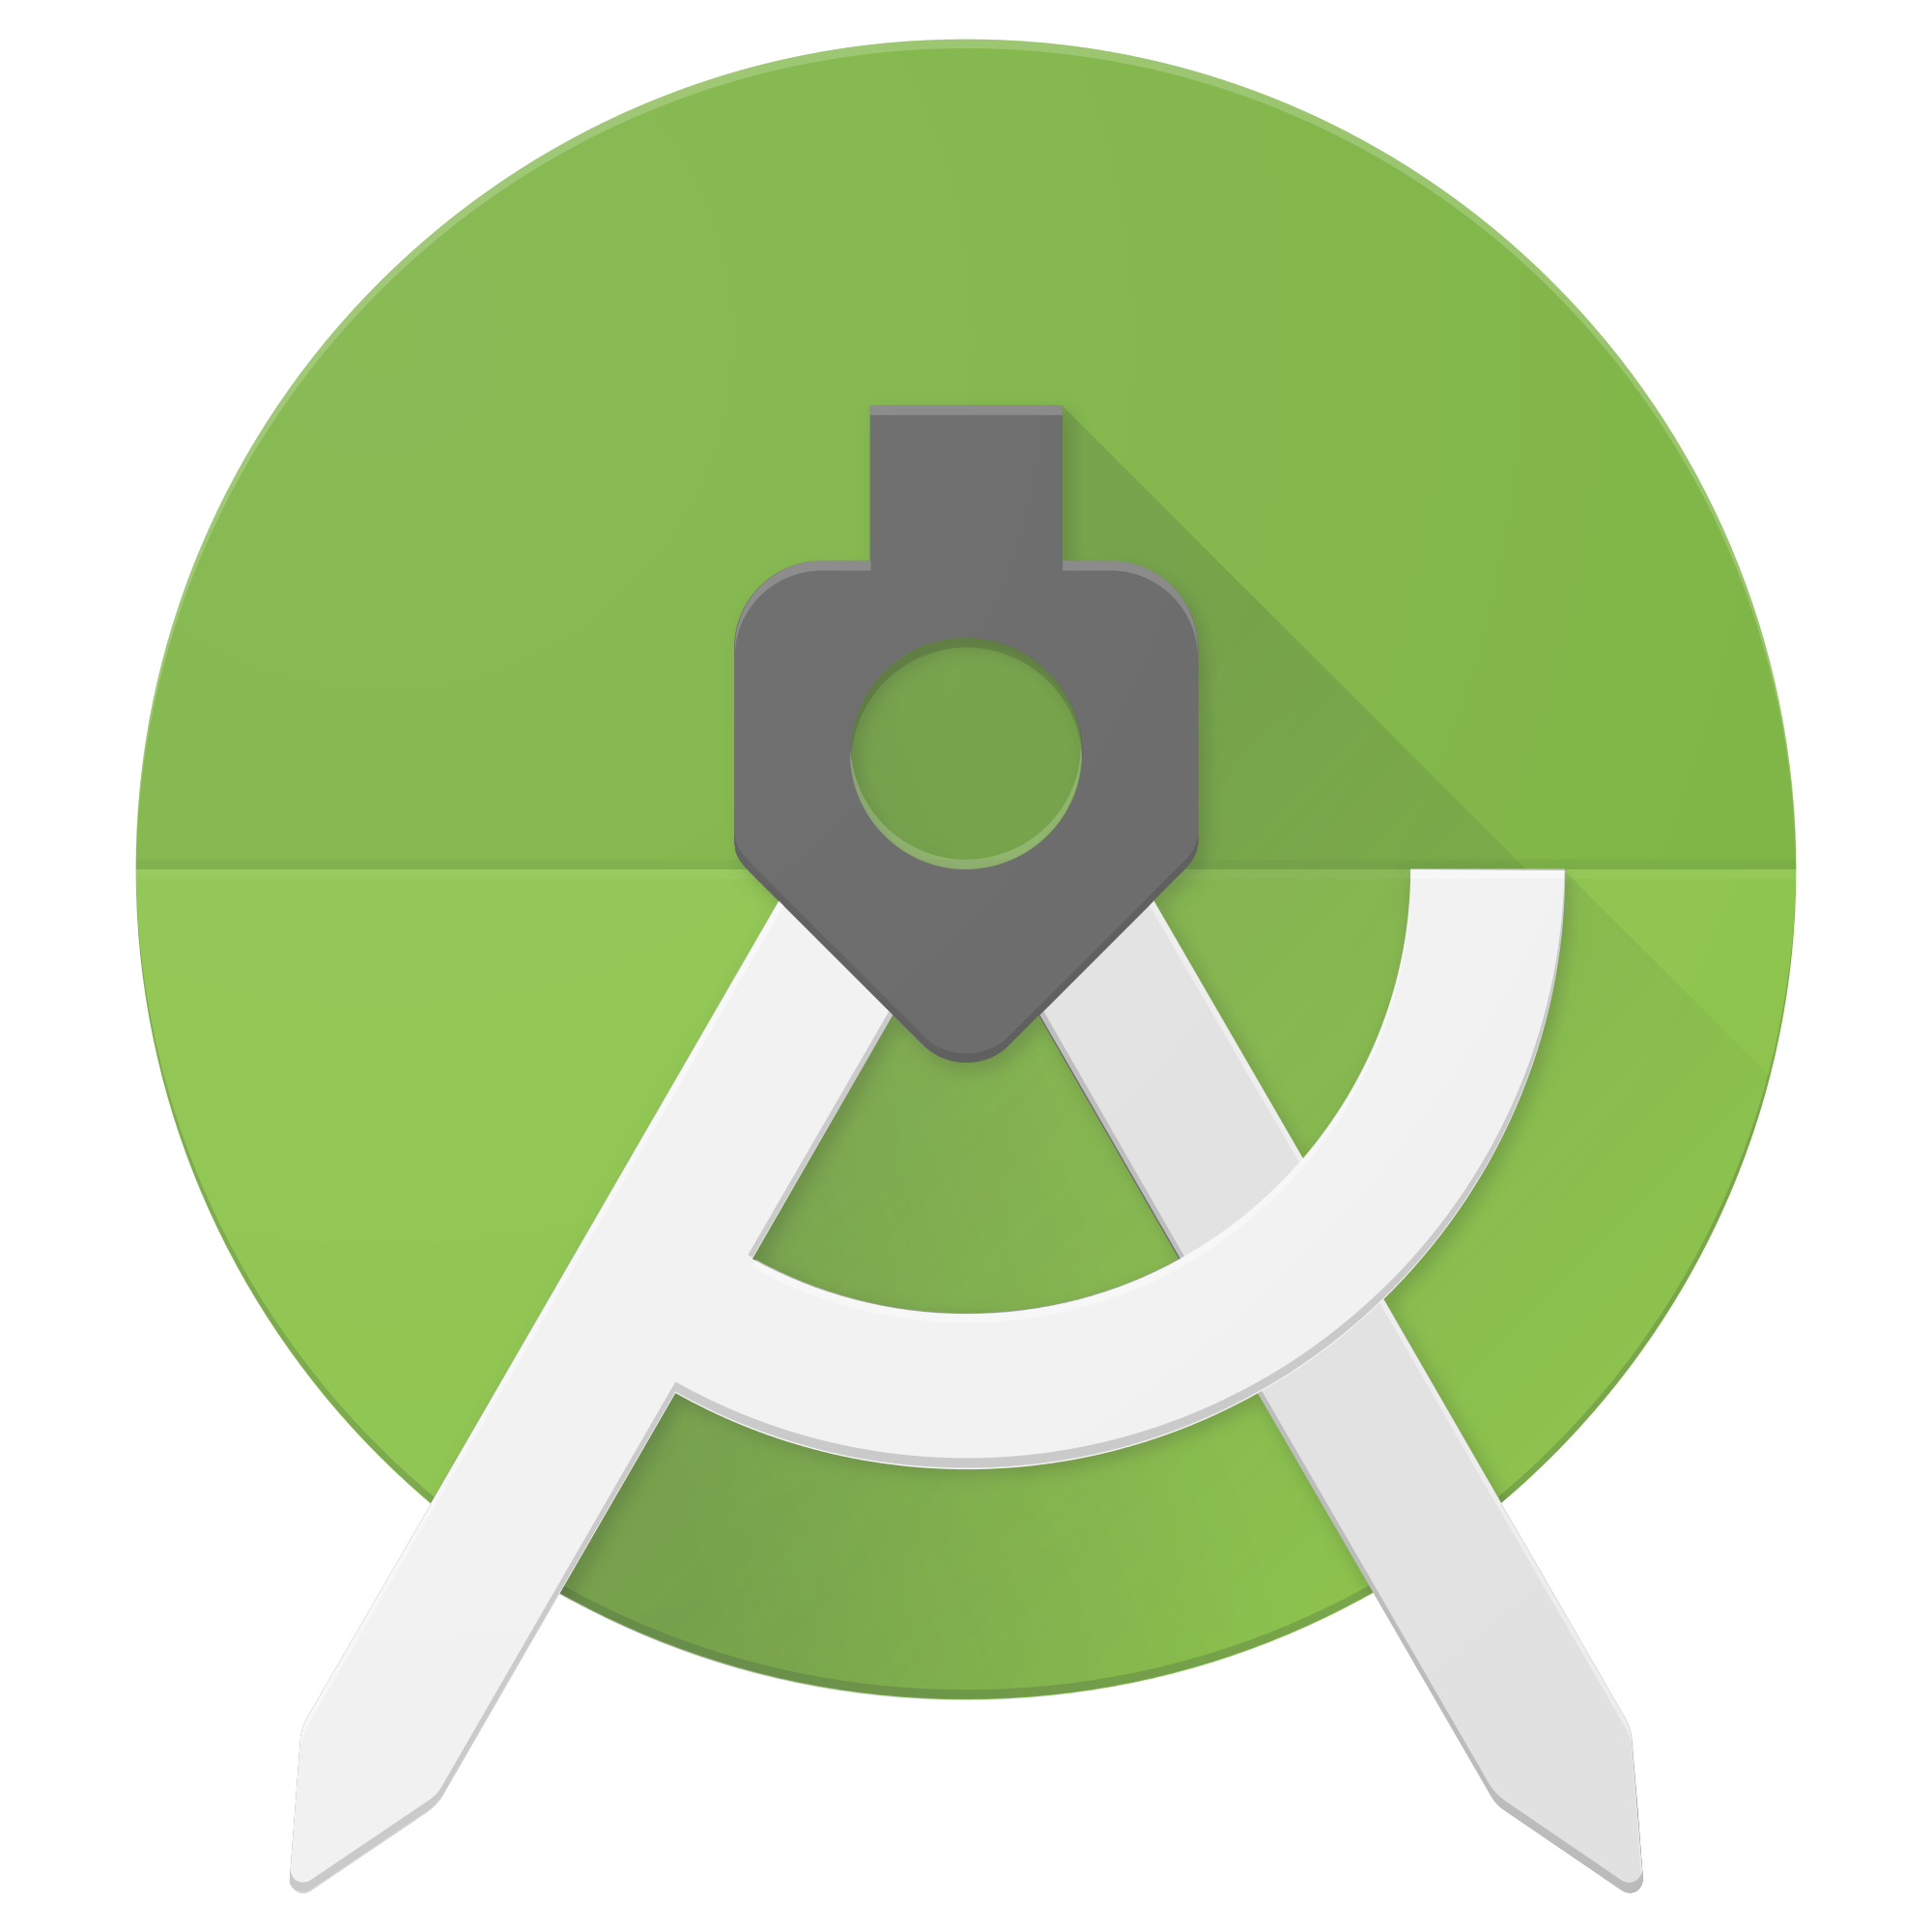 vector black and white Using svg android. File studio icon wikimedia